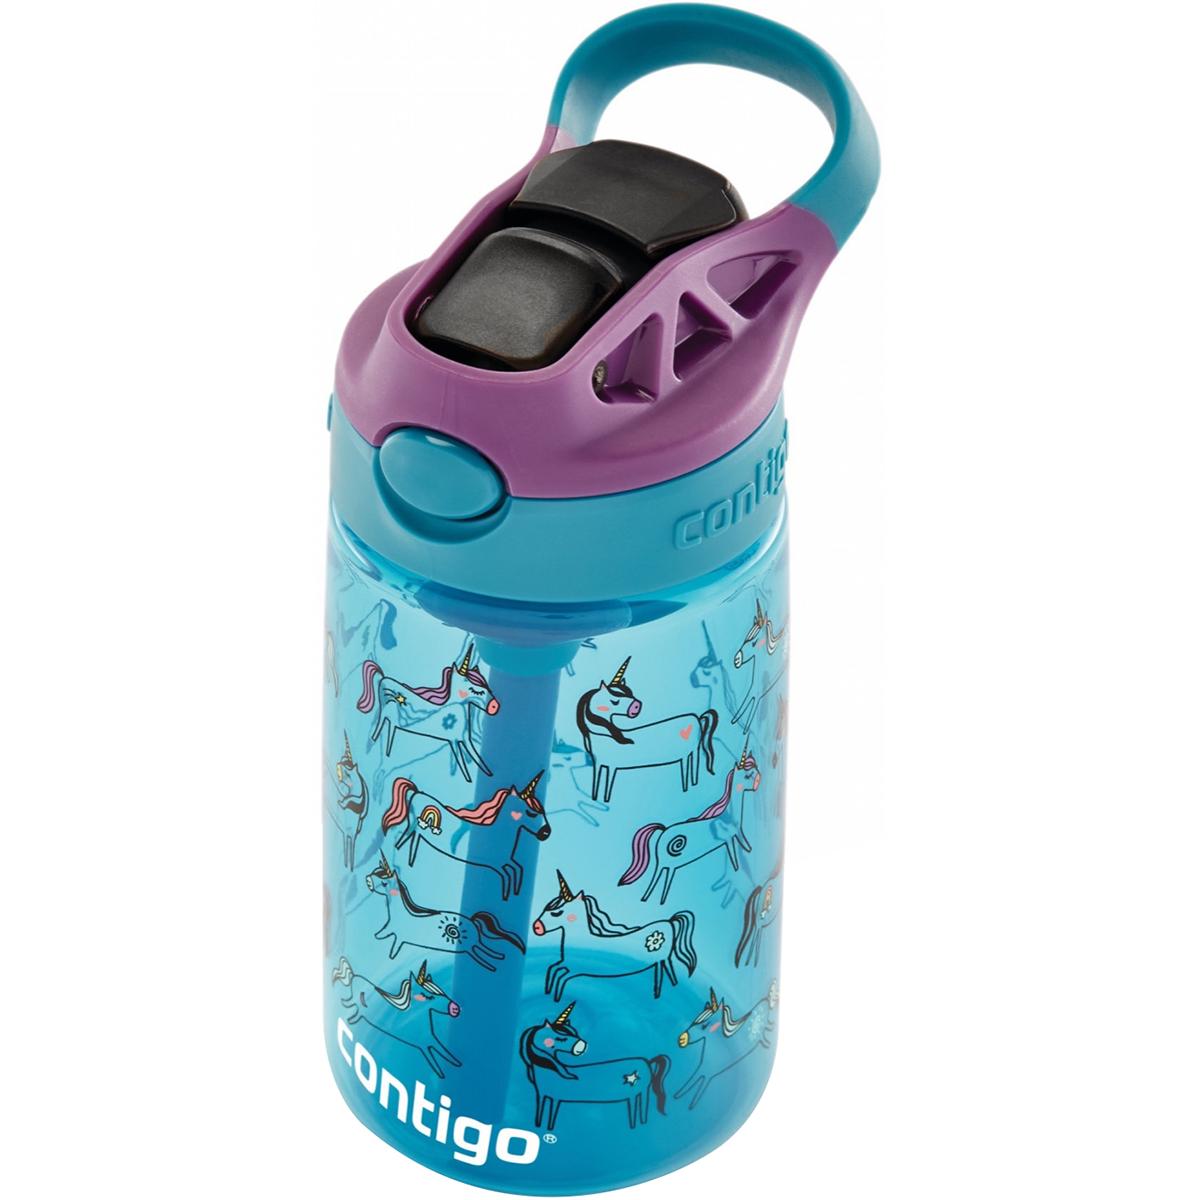 Contigo-Kid-039-s-14-oz-AutoSpout-Straw-Water-Bottle-with-Easy-Clean-Lid thumbnail 42